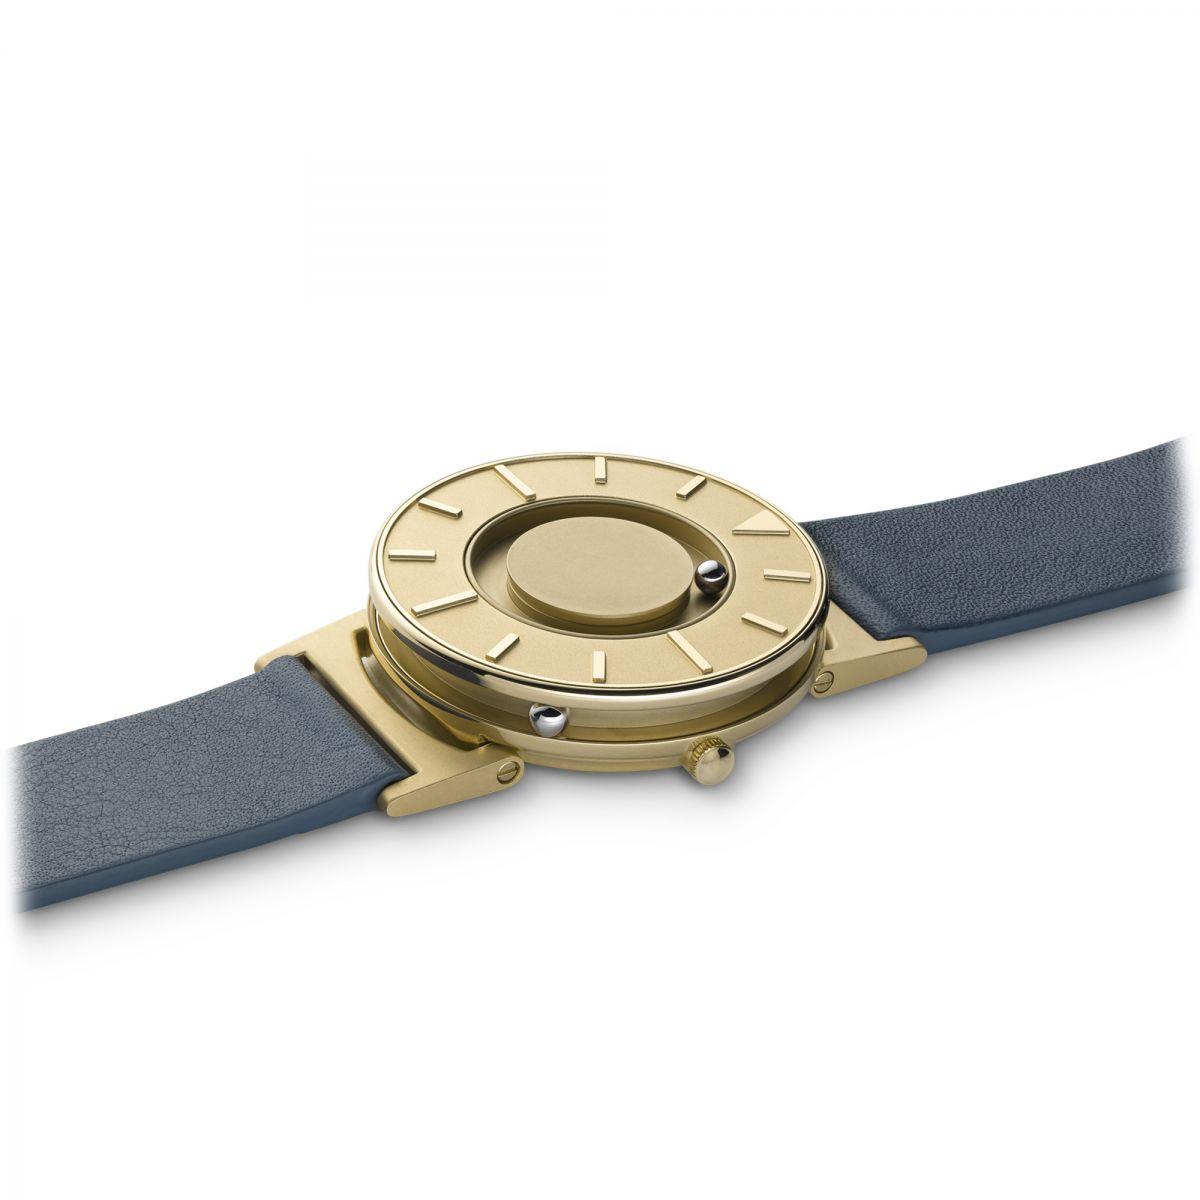 Lux Watches - Best Buy